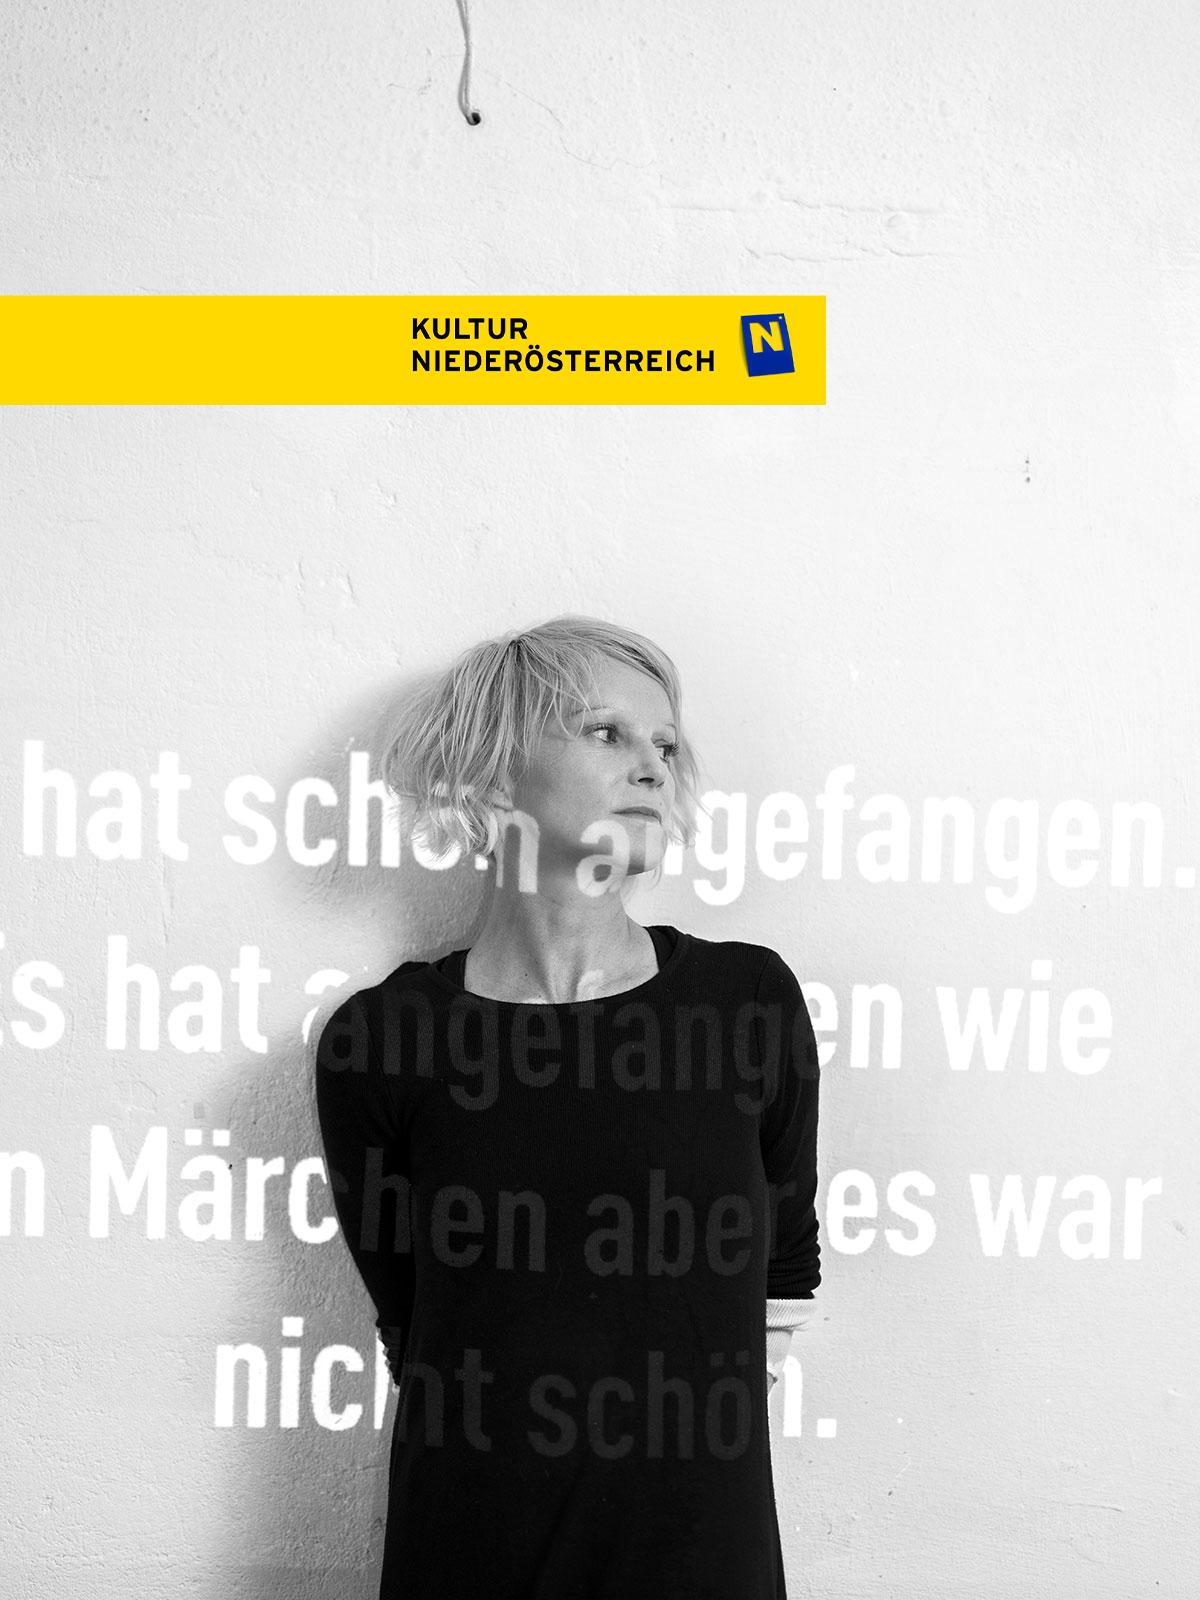 Sabine-Maier_KPNOE2019_©Auftragsfoto_Sappert_DSCF7336